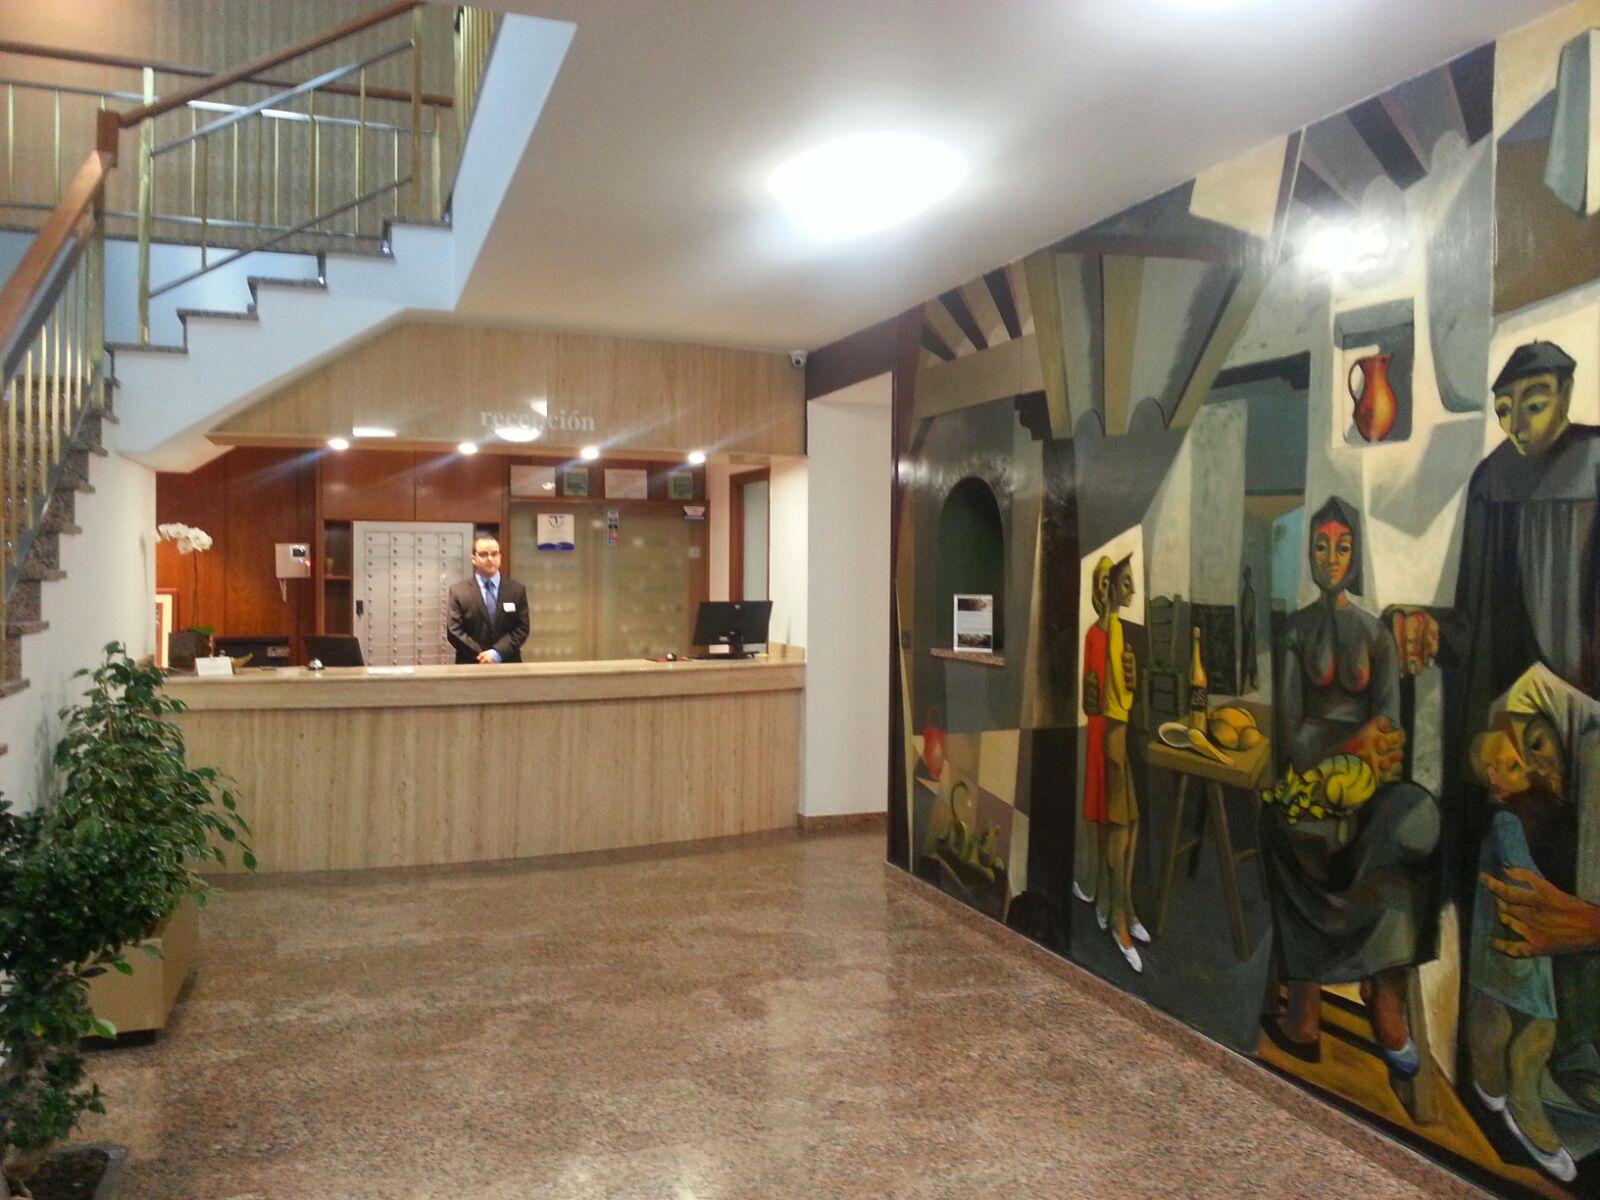 Reapertura Hotel Insula Barataria